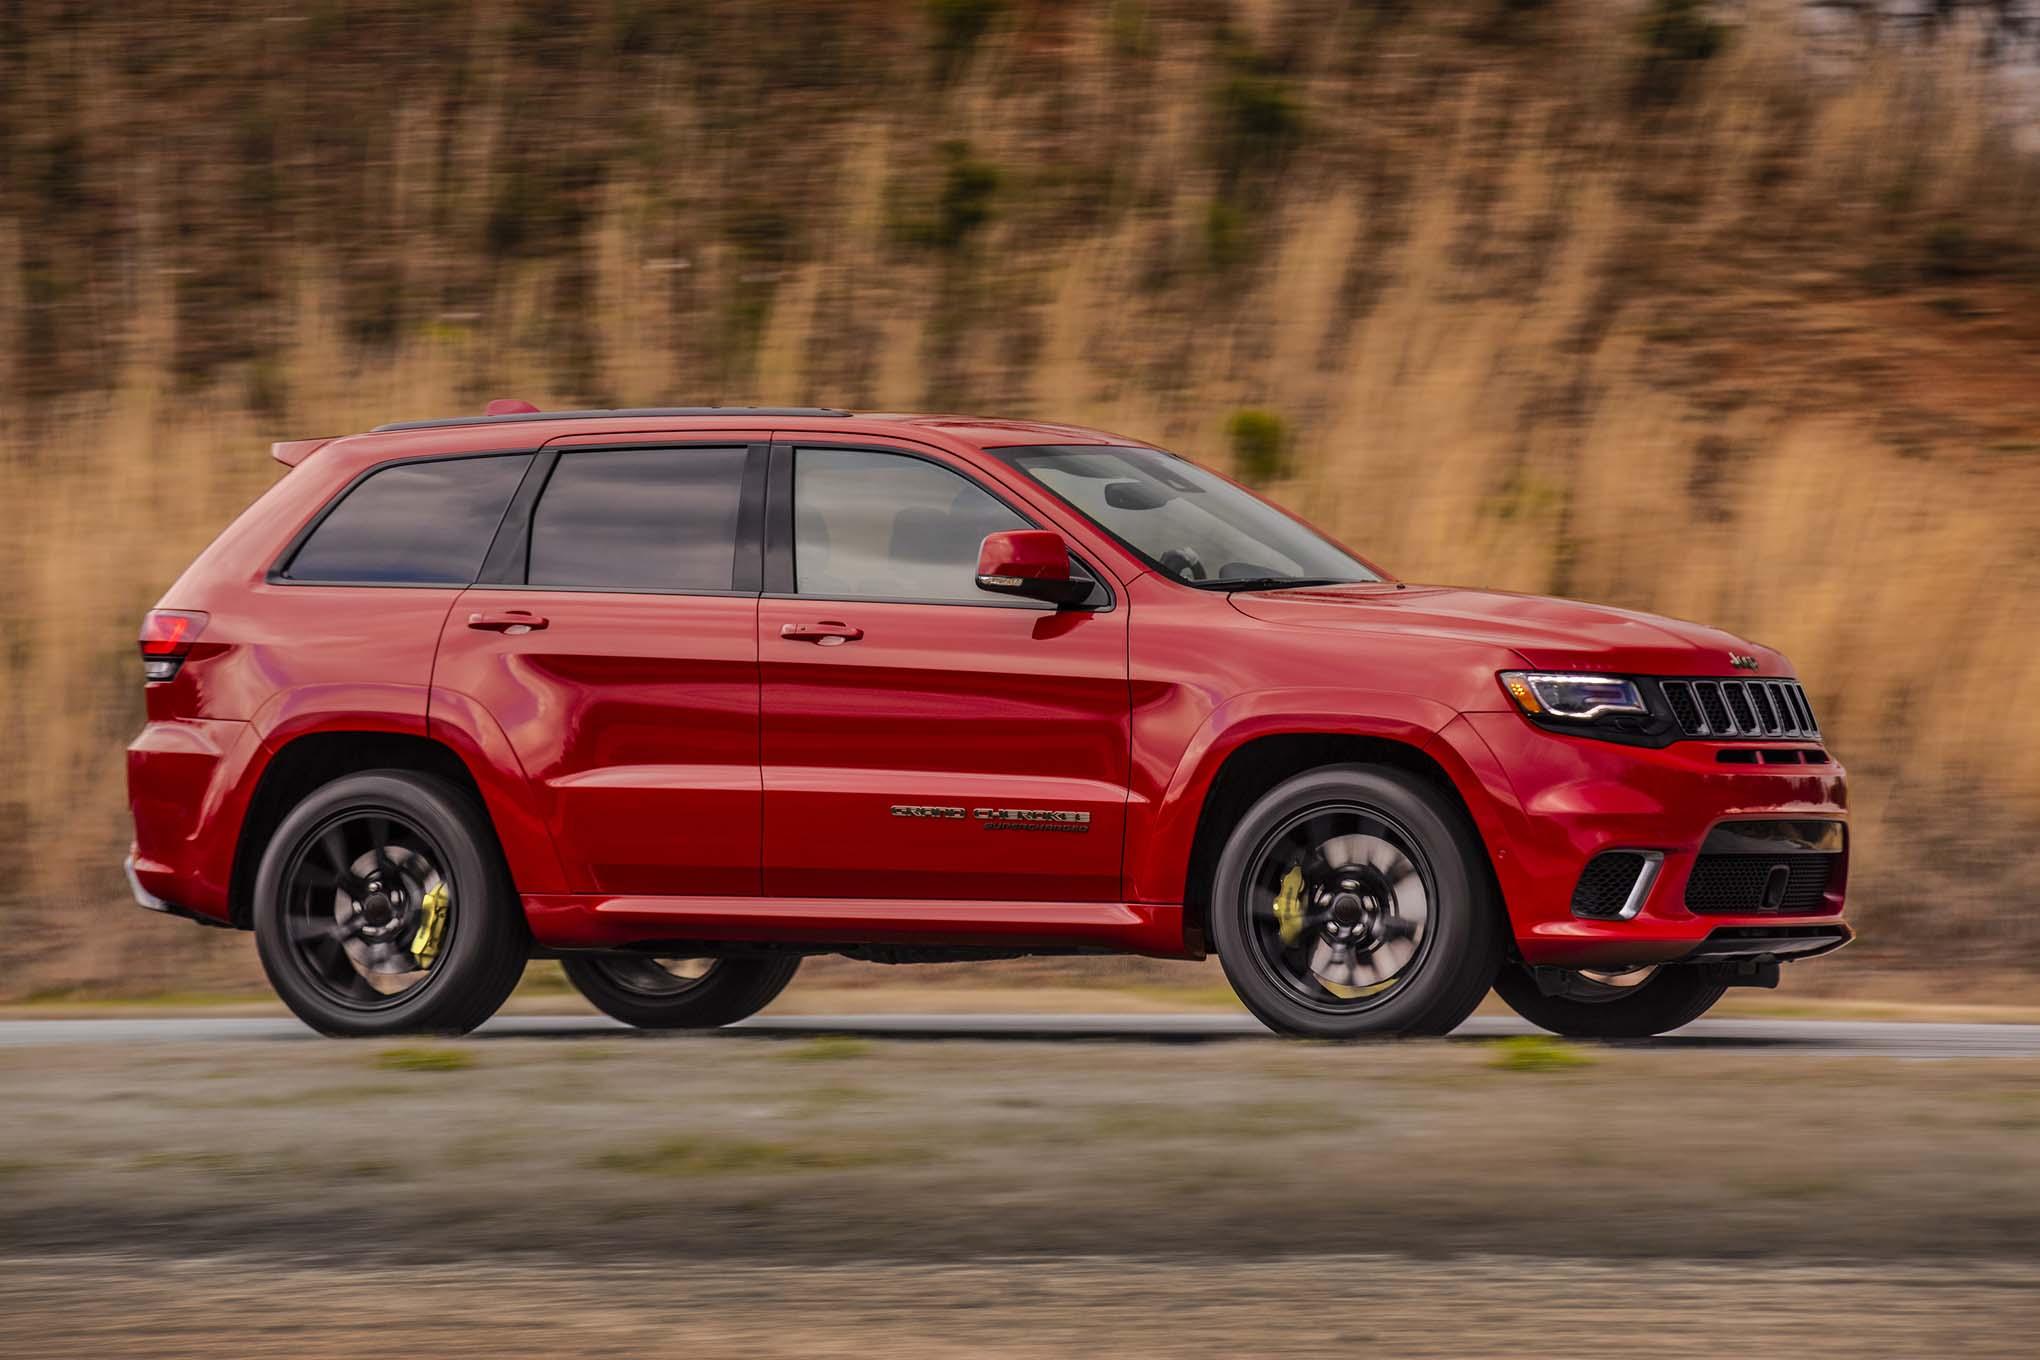 2018 Jeep Grand Cherokee Trackhawk Side In Motion 02